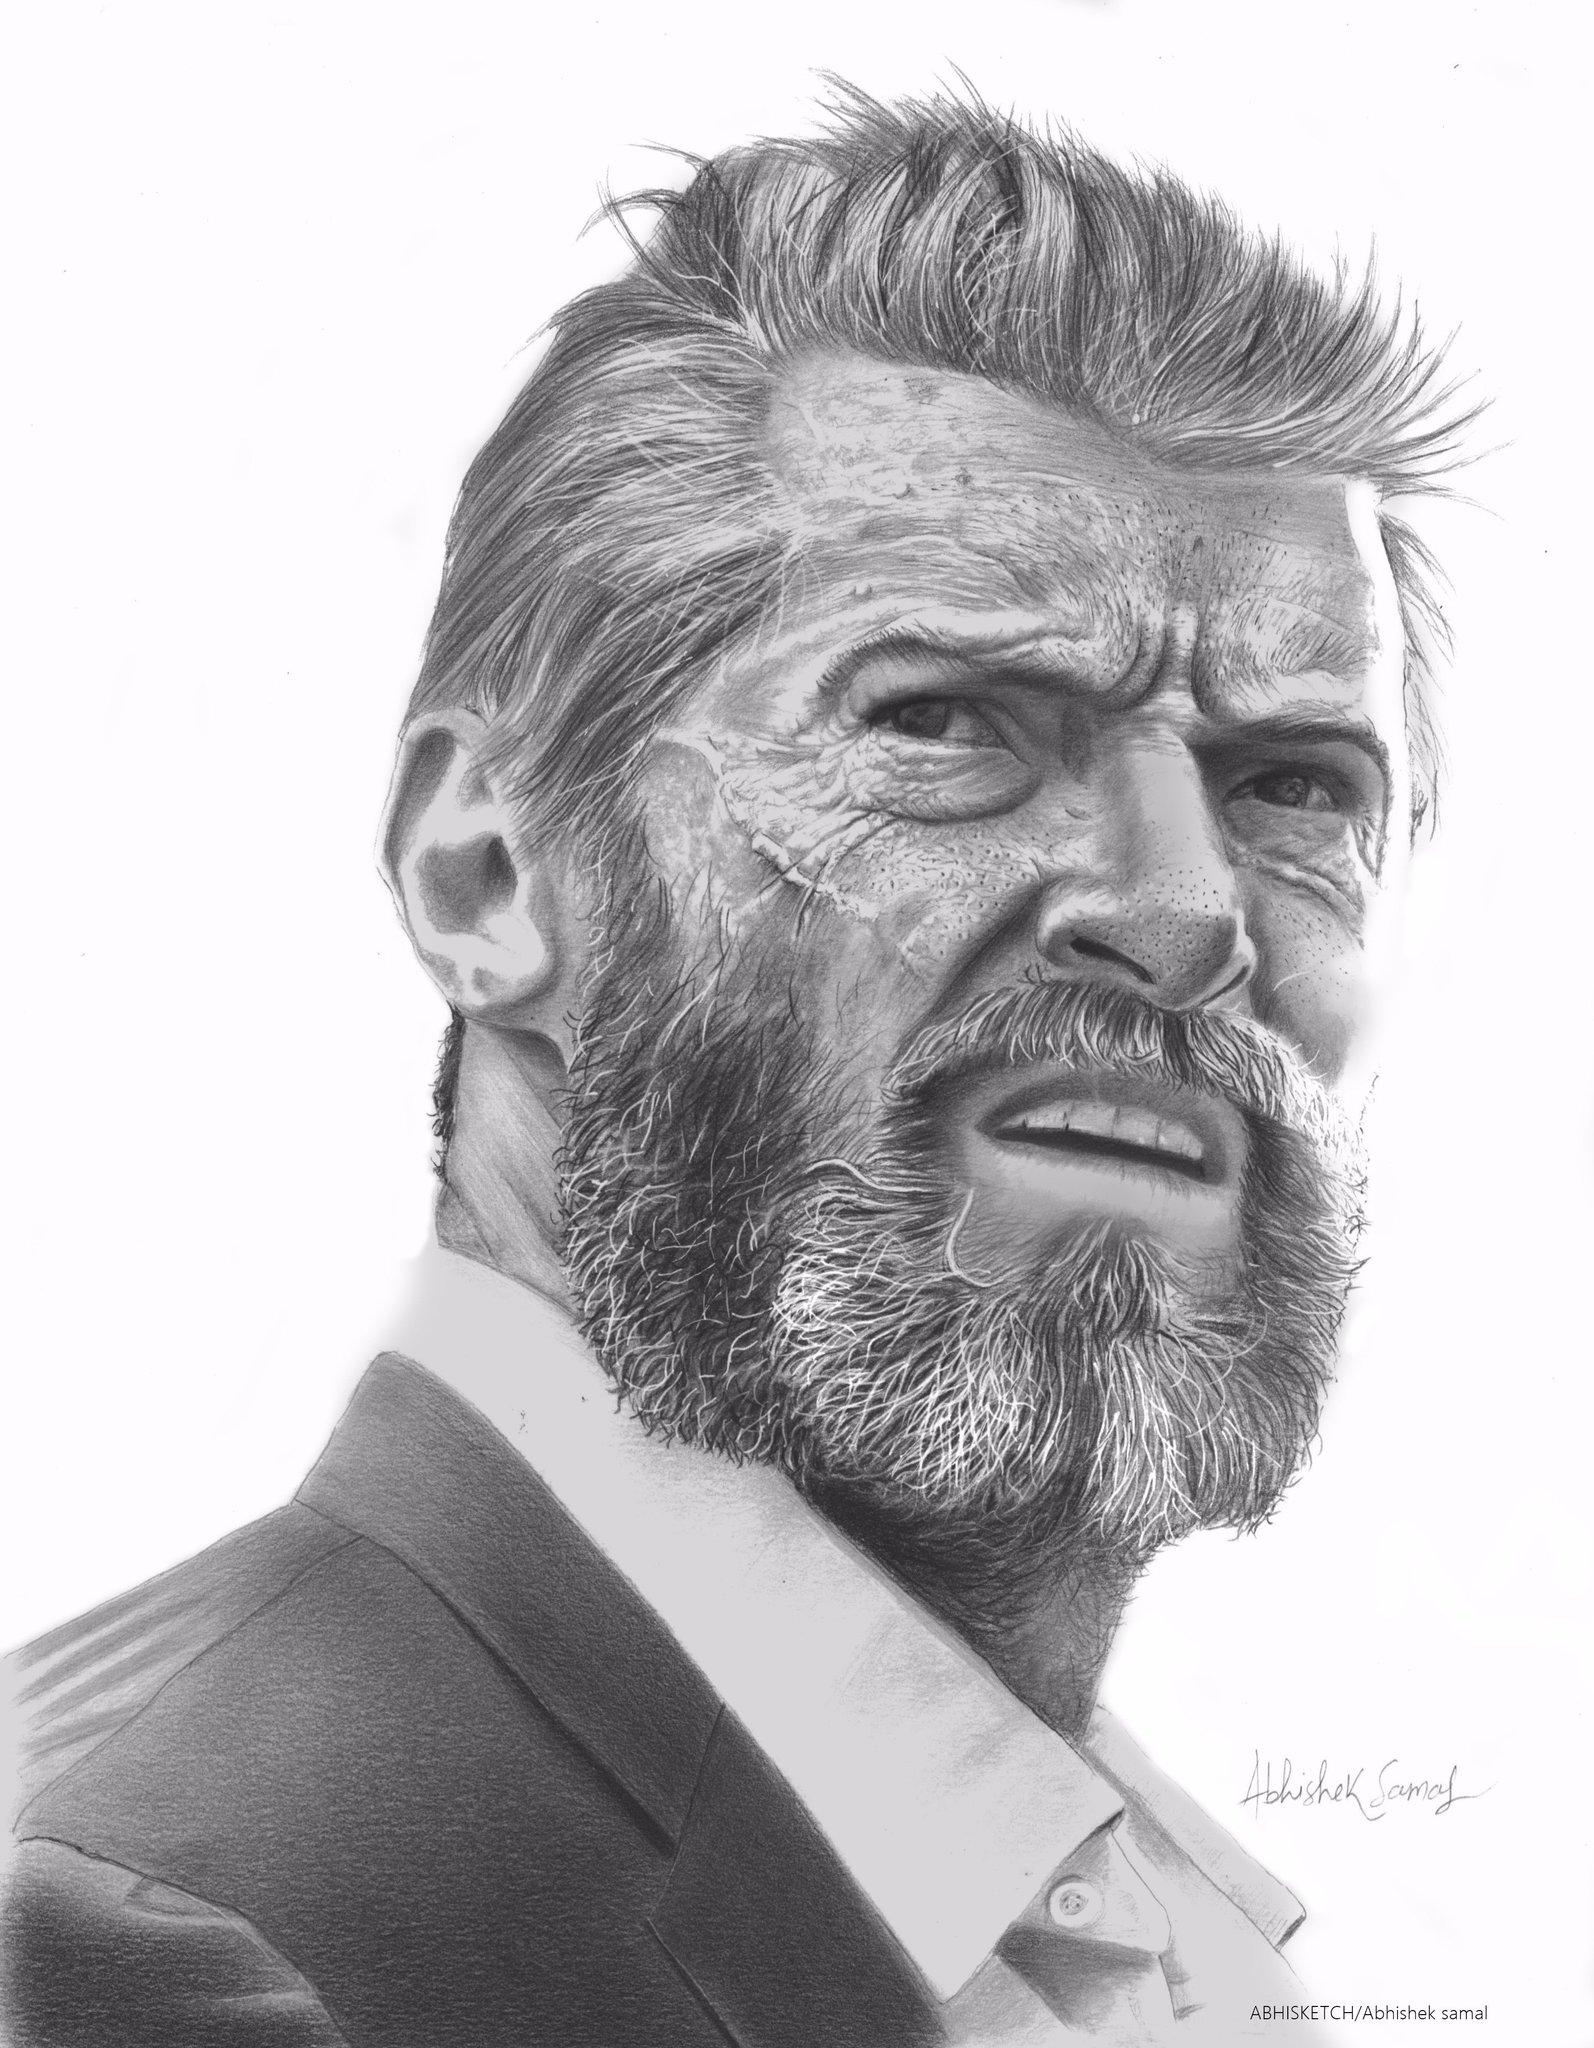 Happy Birthday to hugh jackman  This pencil art dedicated 2 u.. i hope u like this..